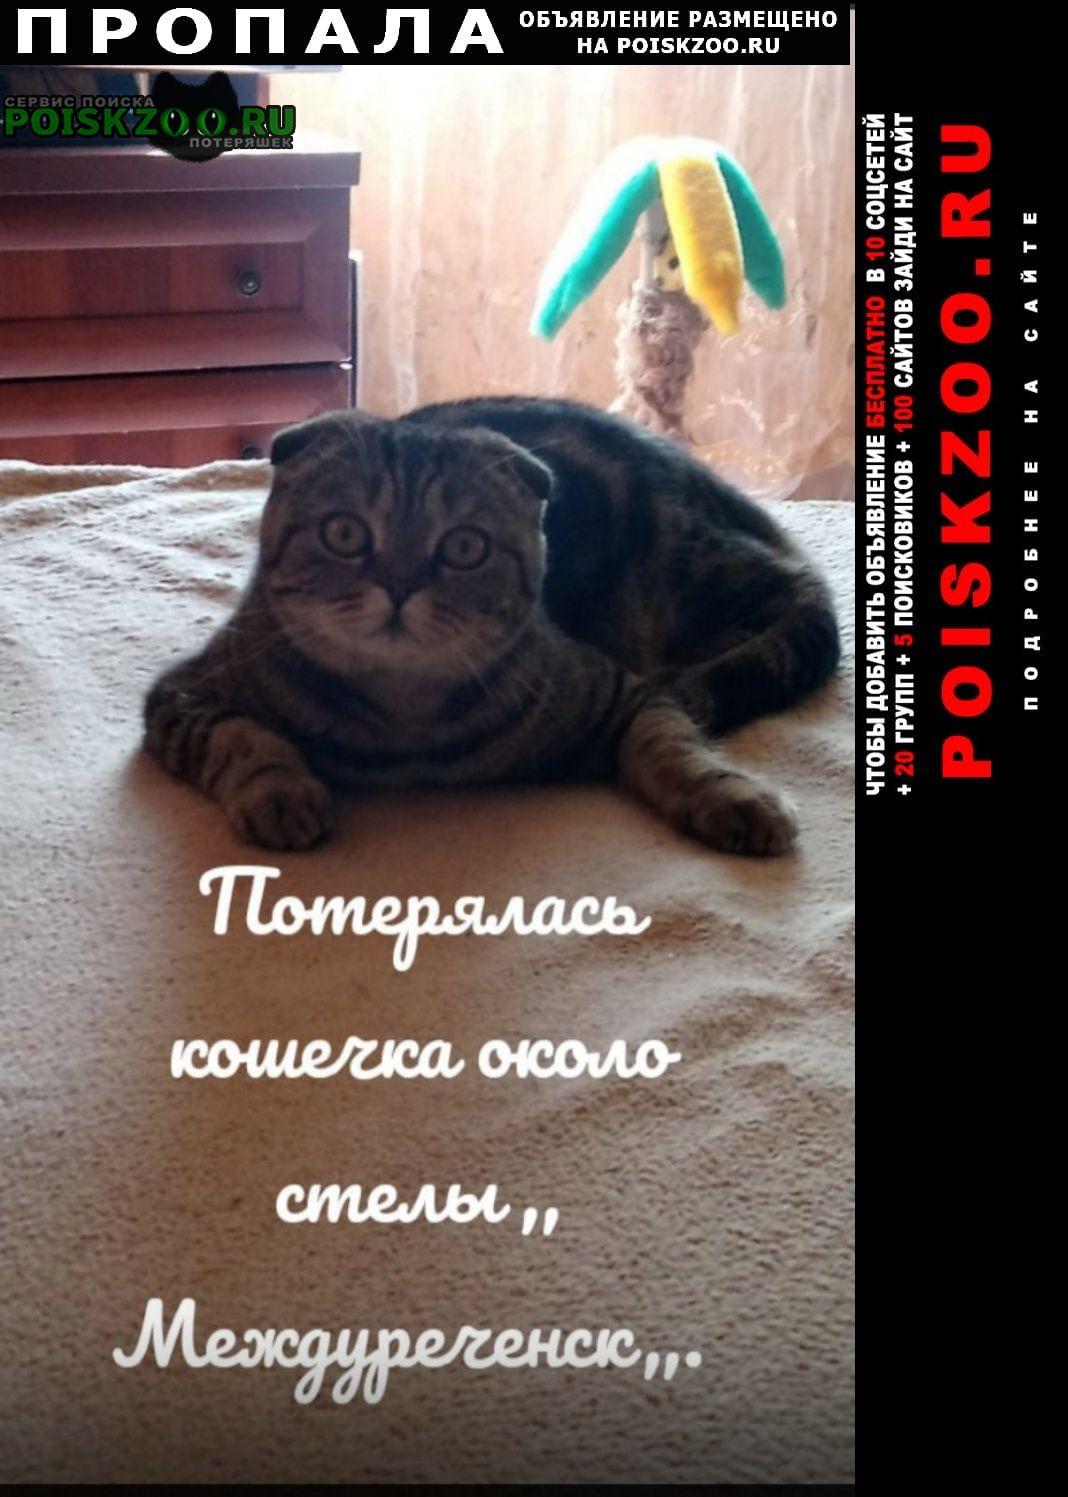 Пропала кошка Междуреченск